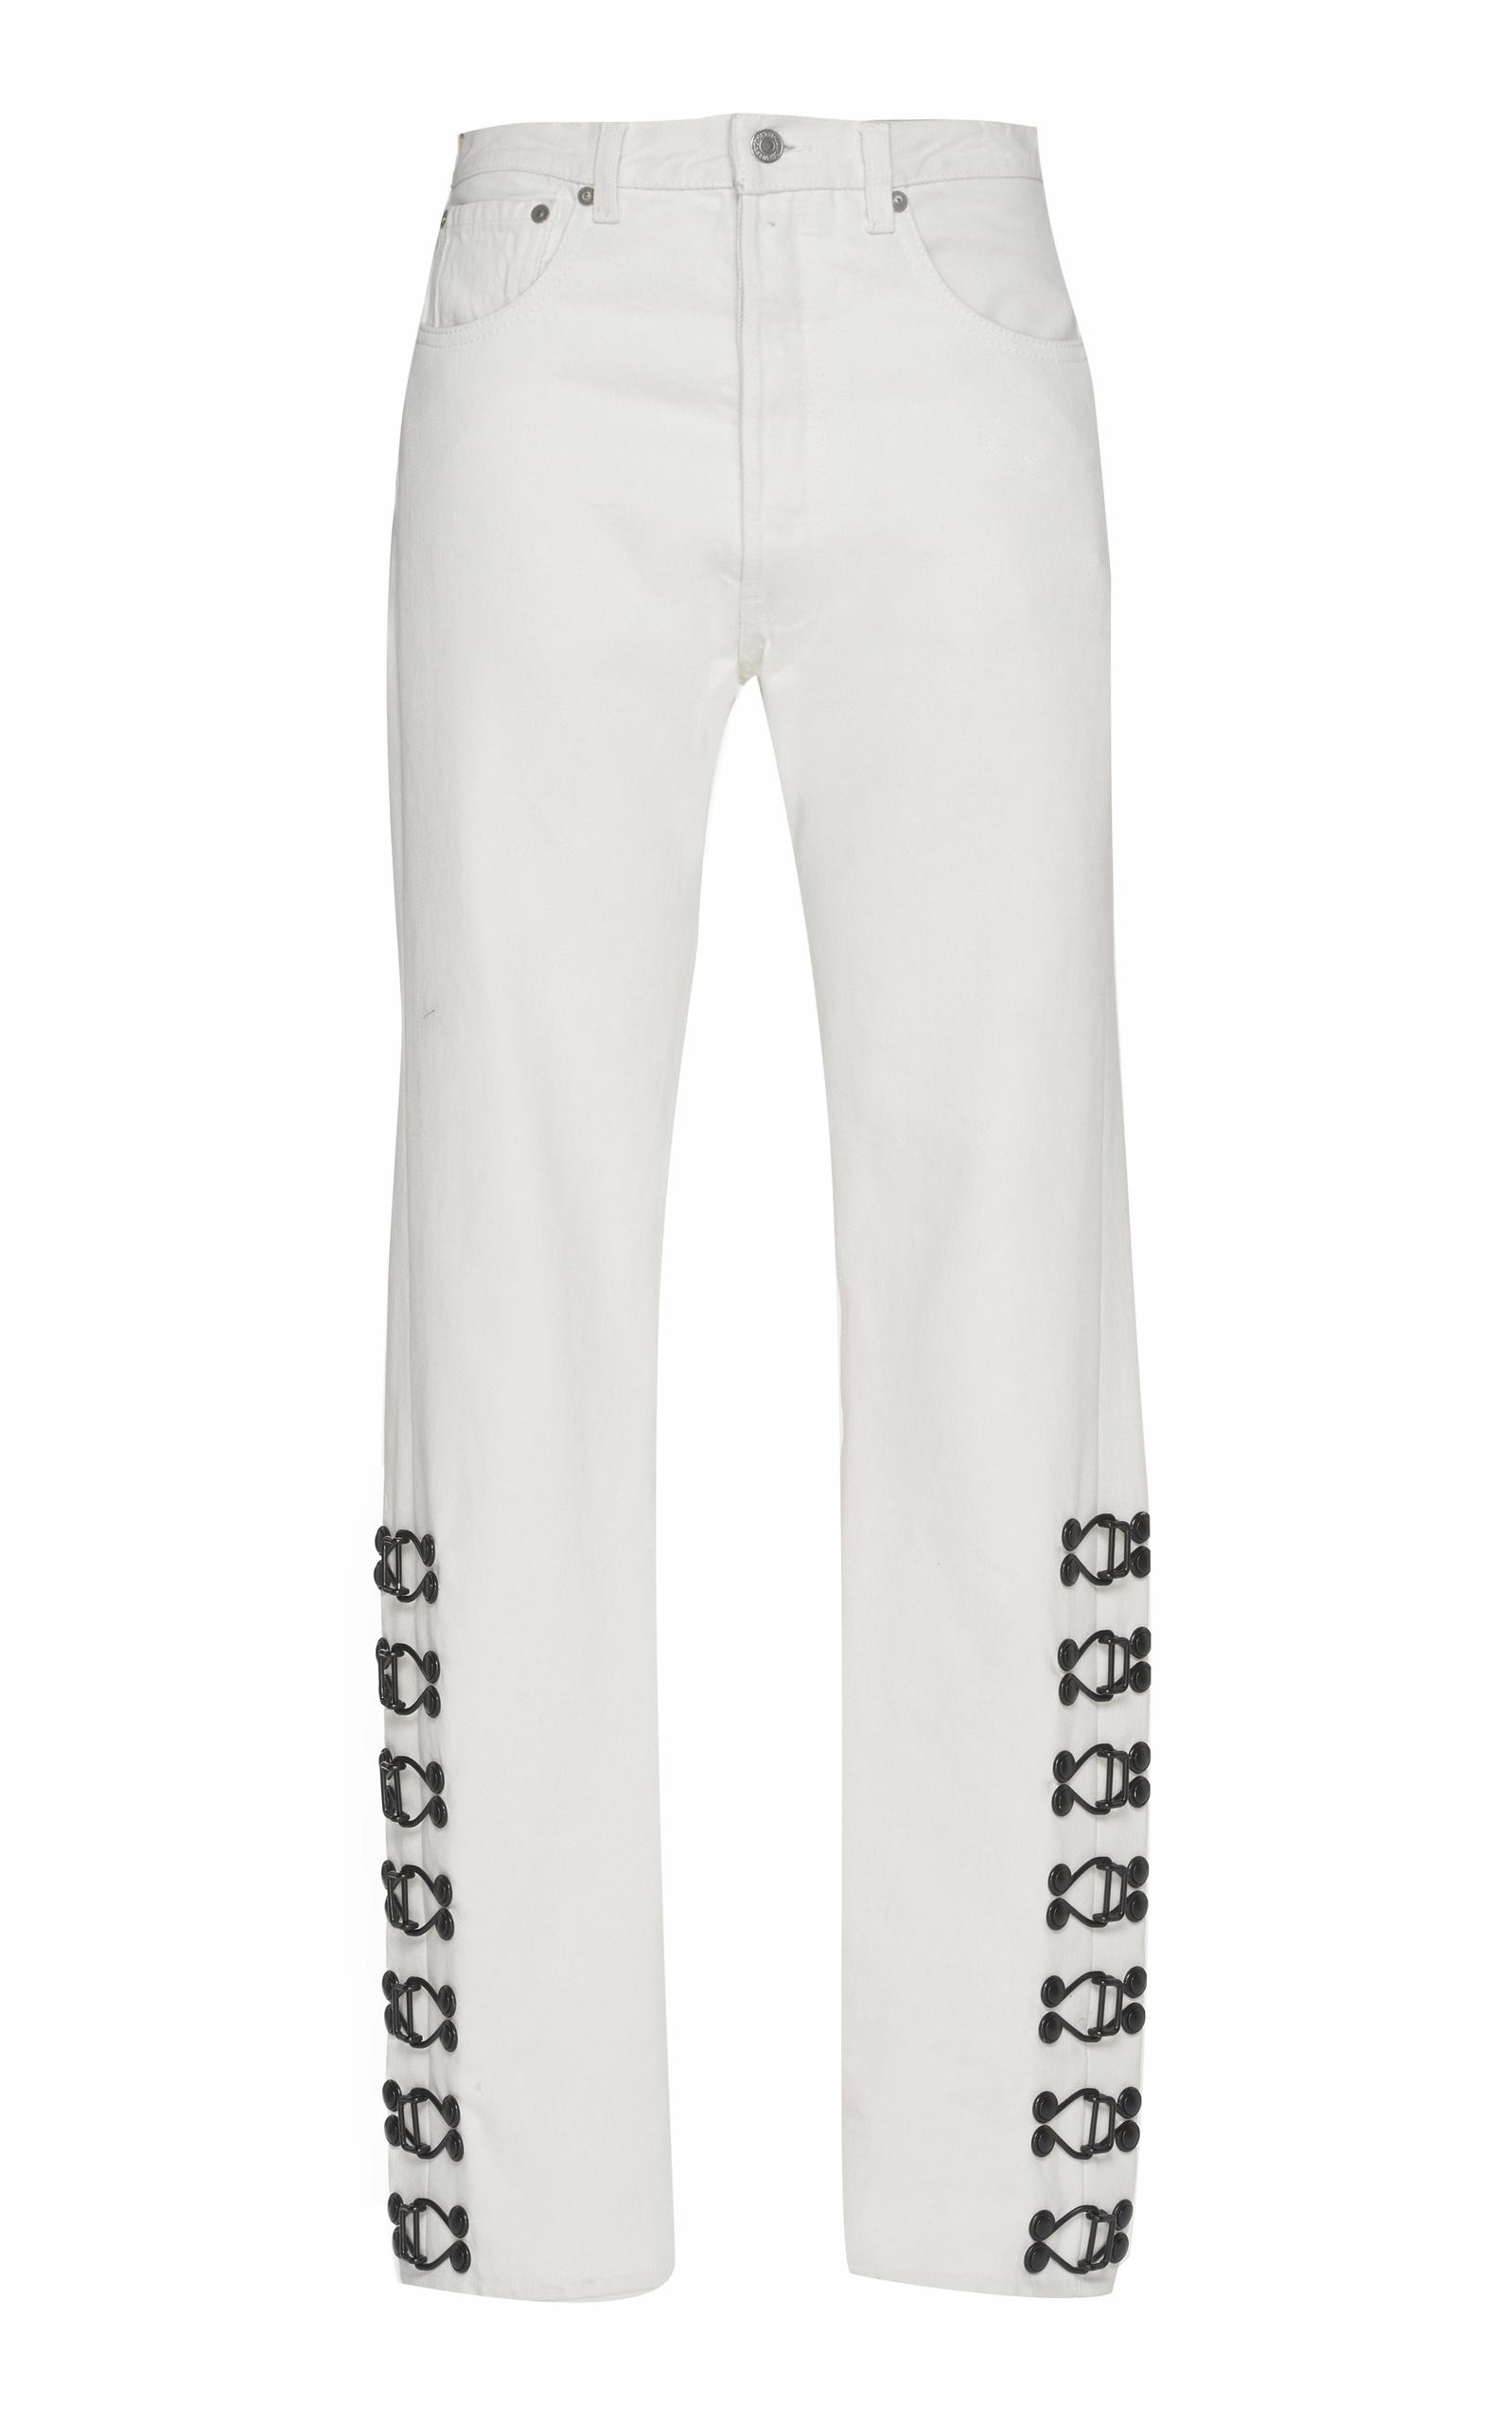 OLIVIER THEYSKENS mid rise hook-and-eye embellished jeans